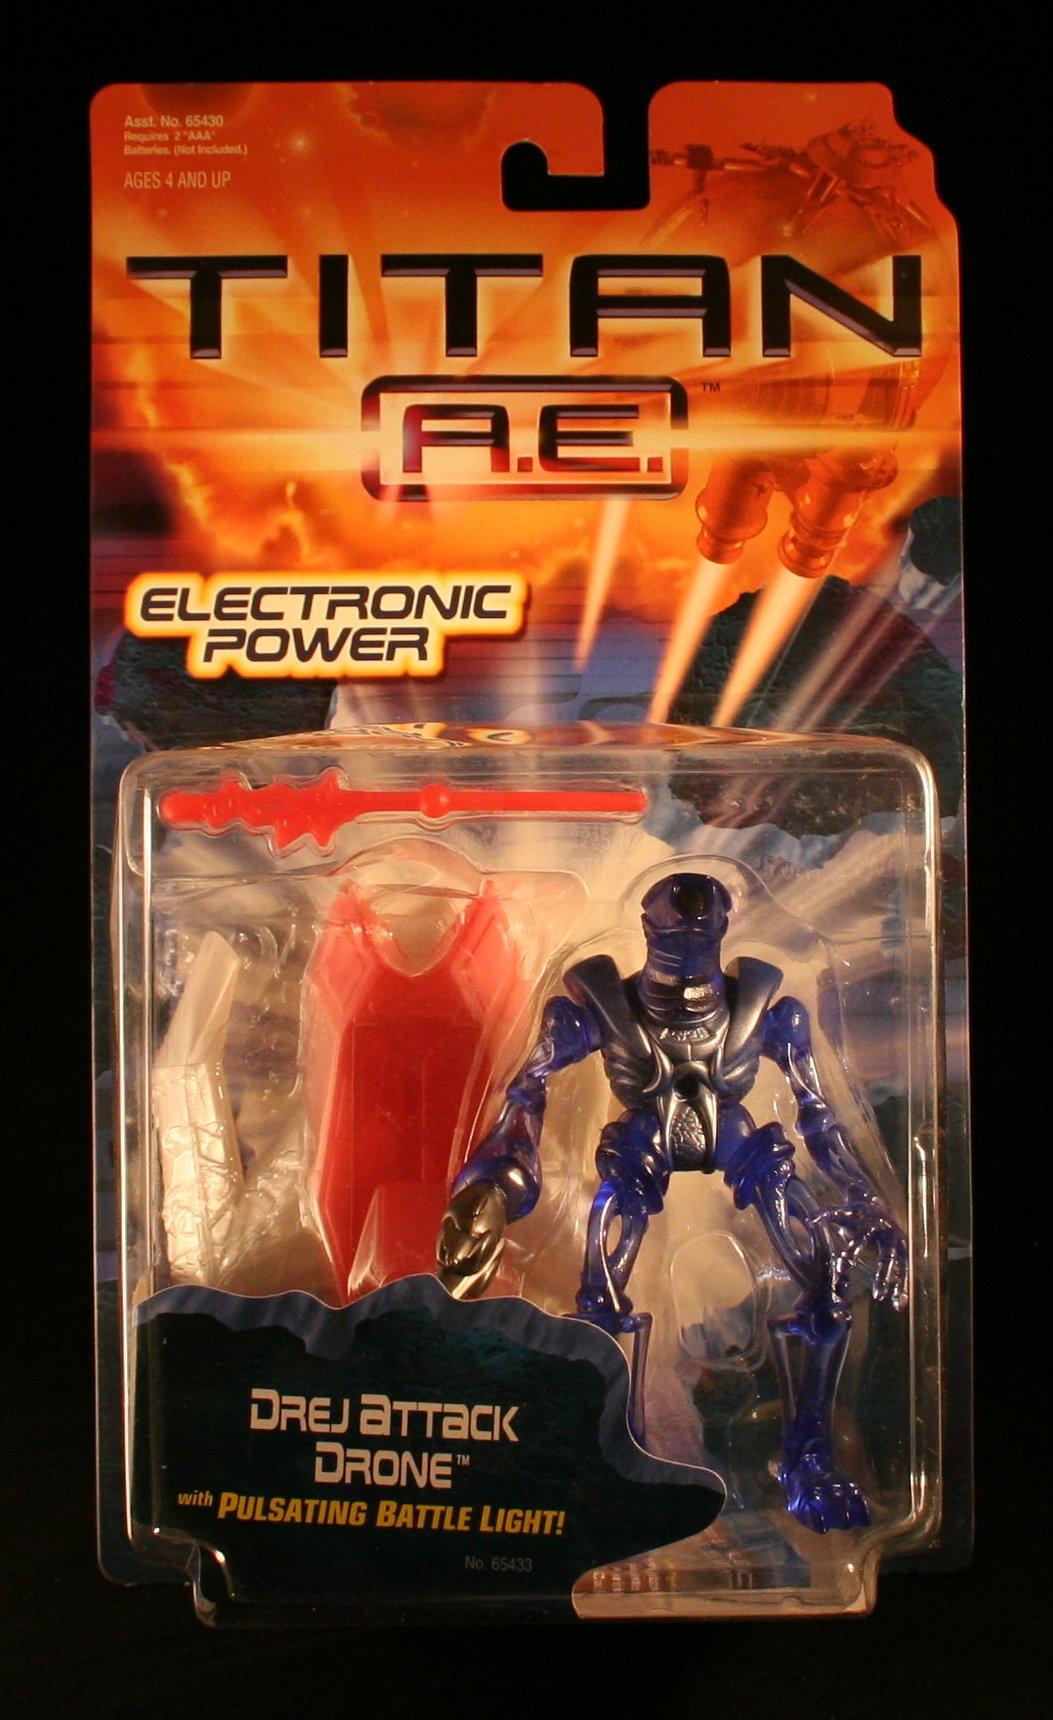 DREJ ATTACK DRONE w/ Pulsating Battle Light TITAN A.E. Electronic Power 2000 Action Figure